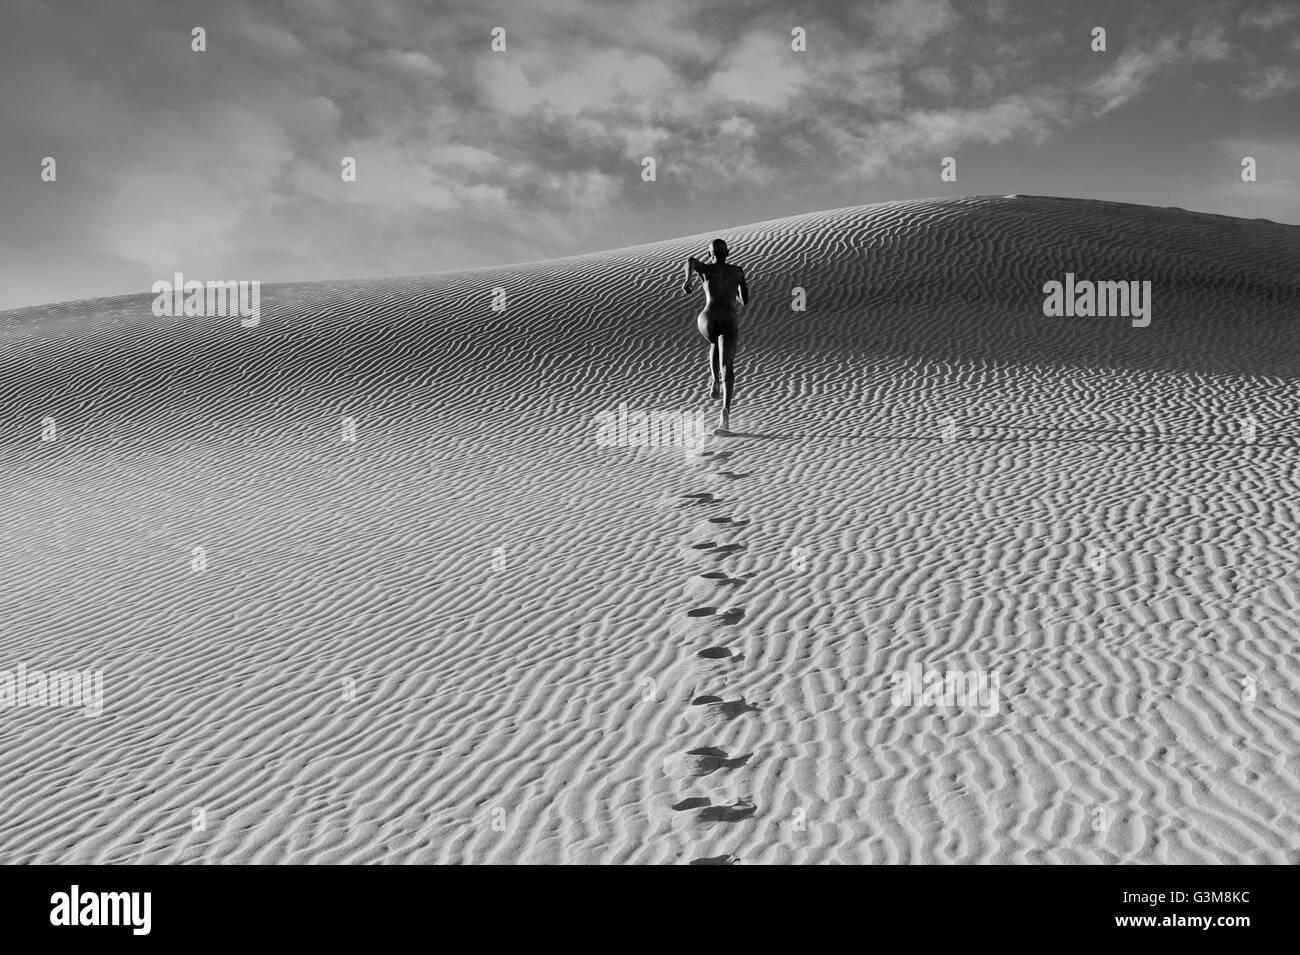 Nude woman running in dessert leaving footprints - Stock Image